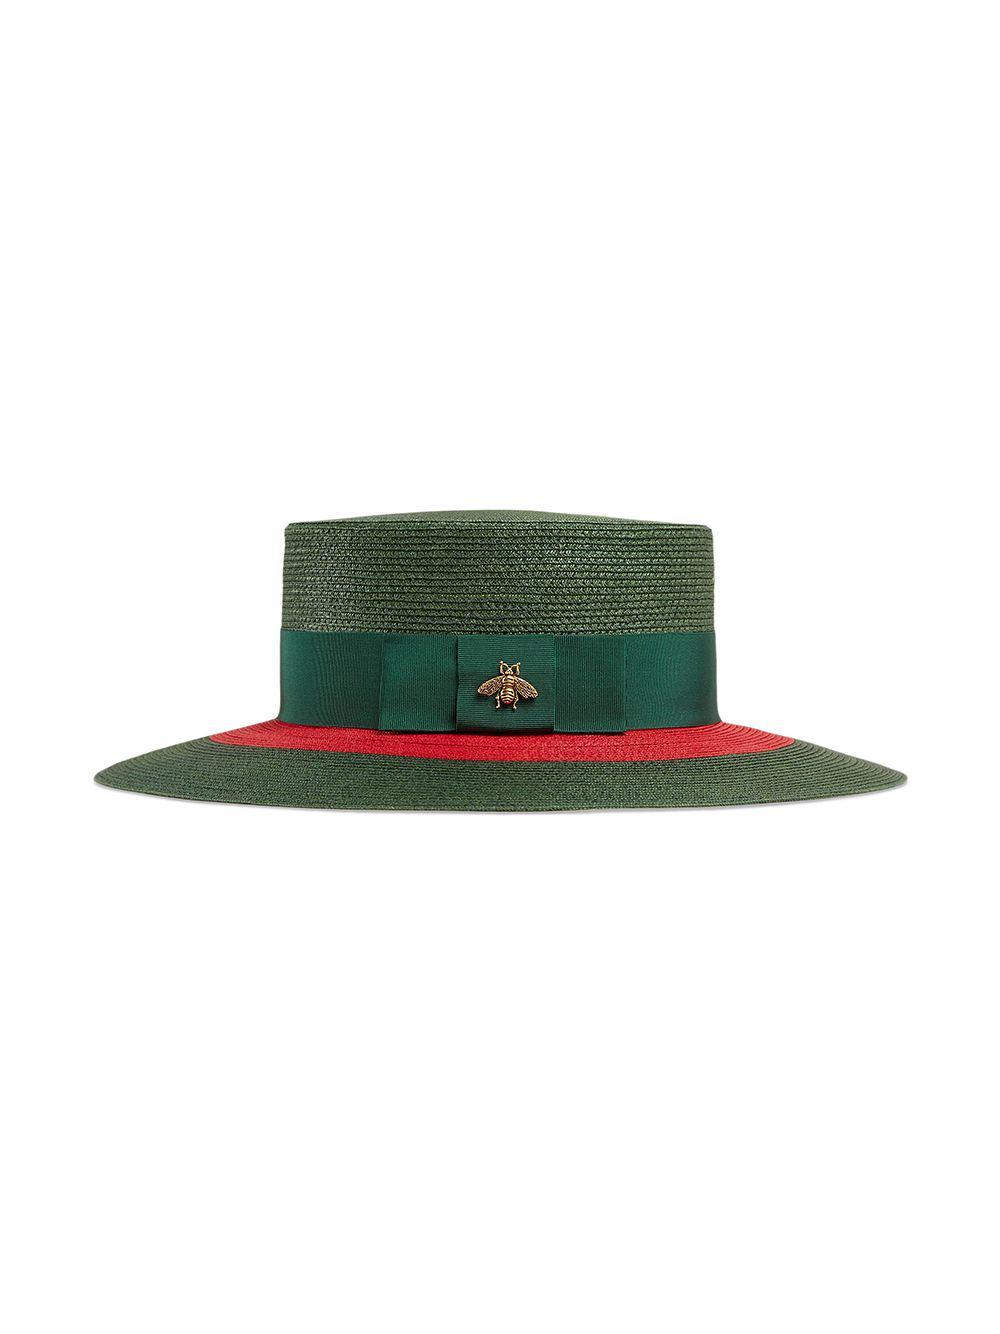 50044ad557e04 Lyst - Gucci Papier Wide Brim Hat in Green for Men